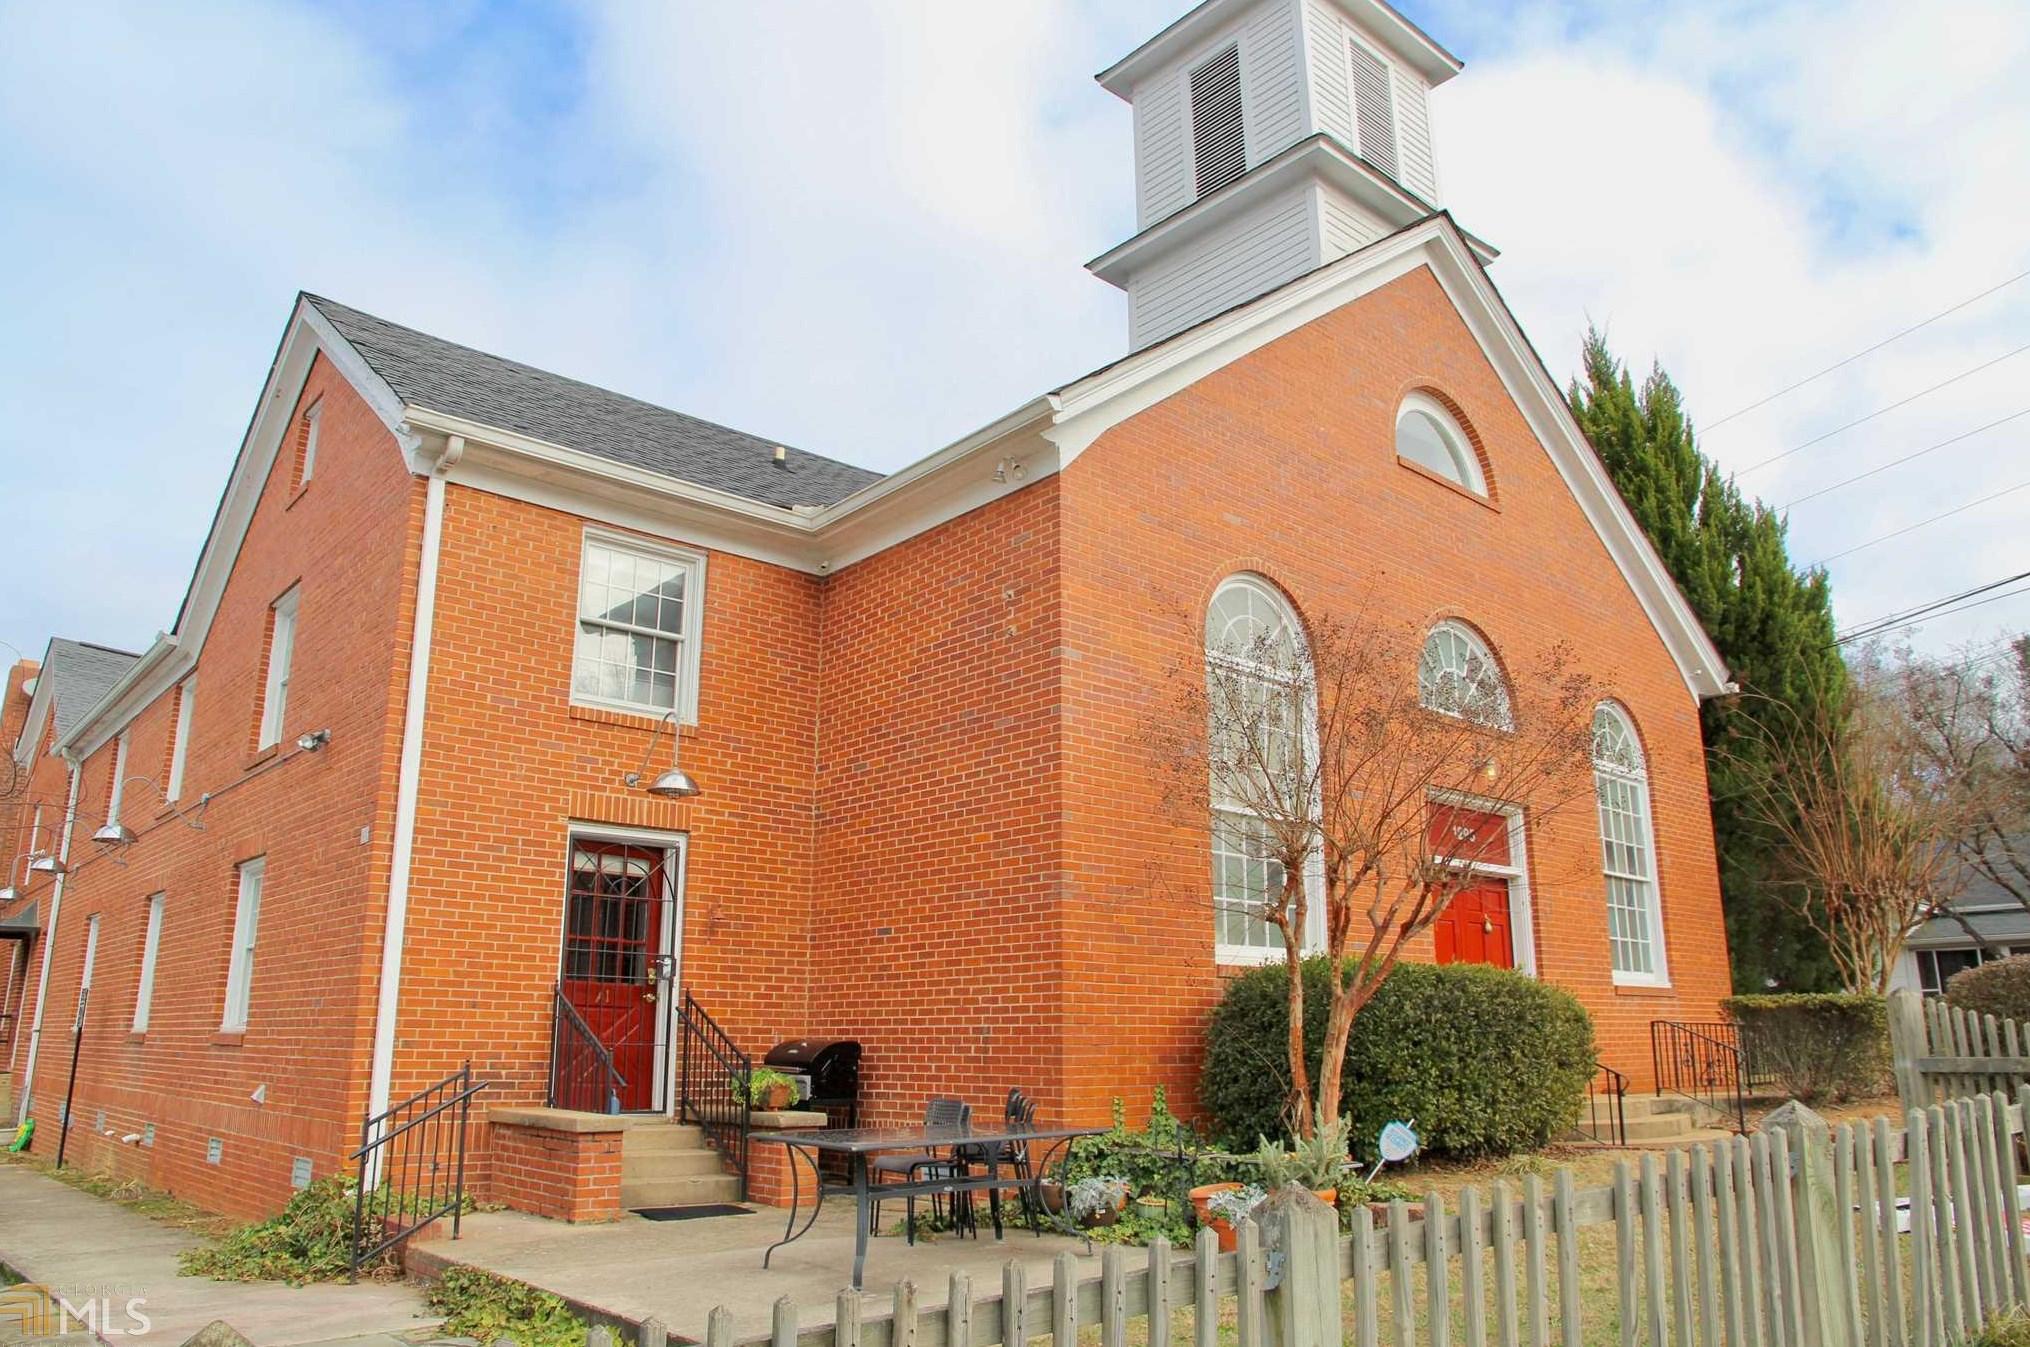 Church building converted into condos.